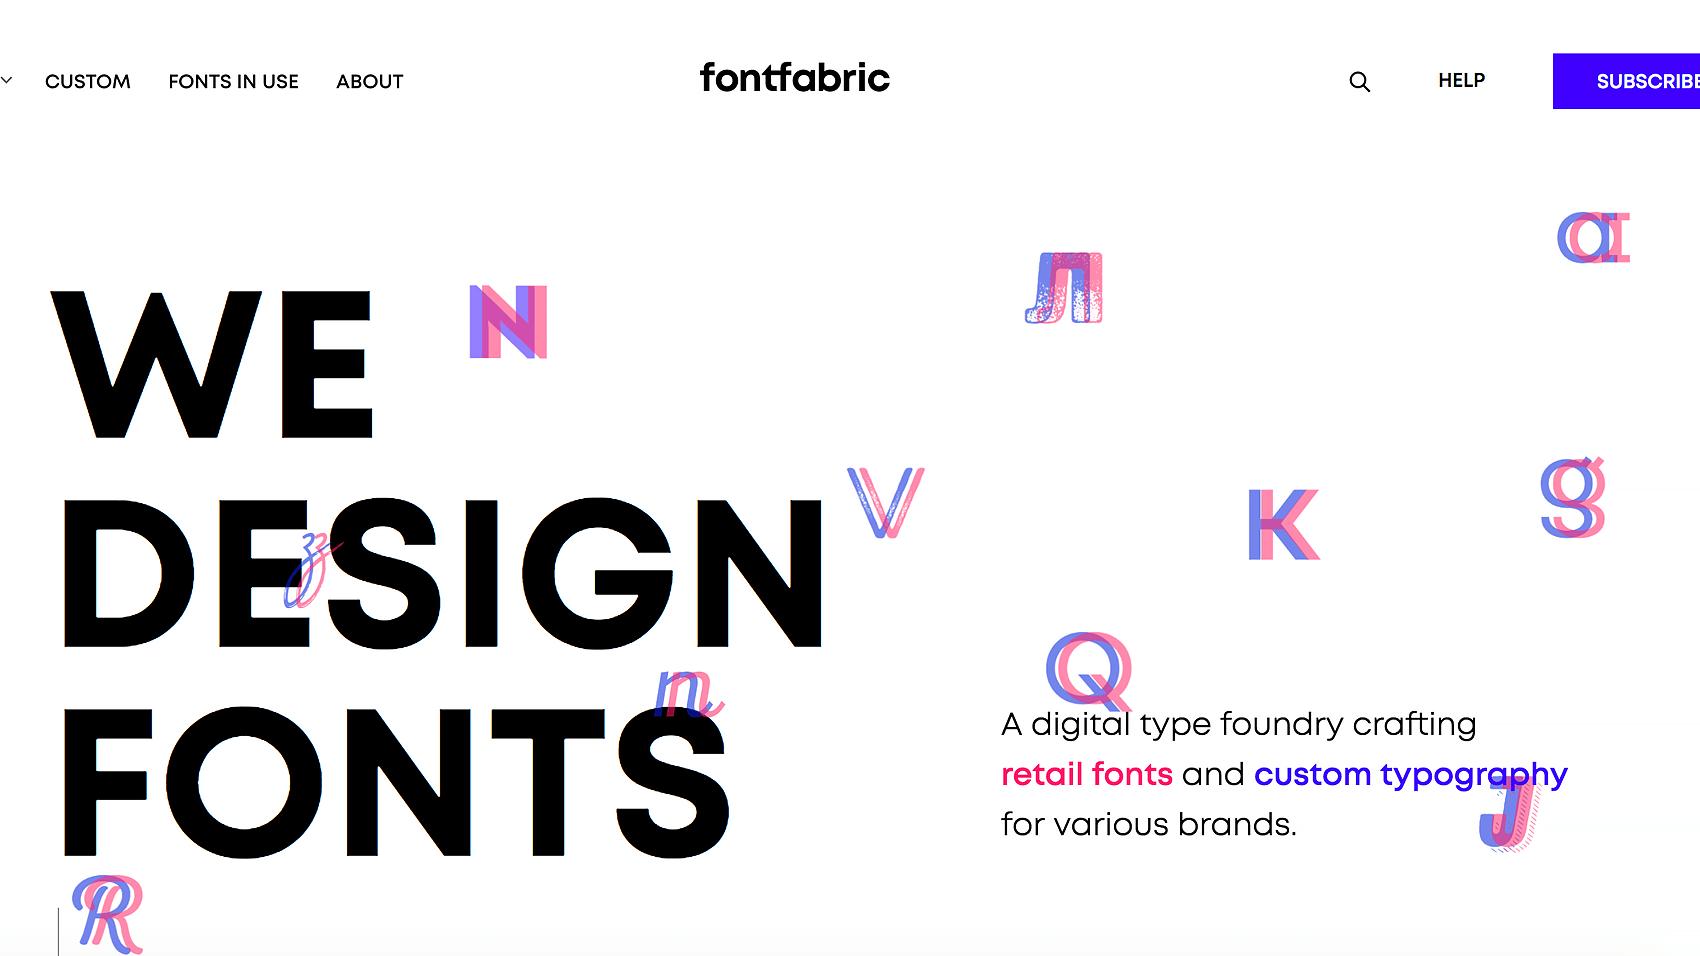 fontfabricのTOPページ画像